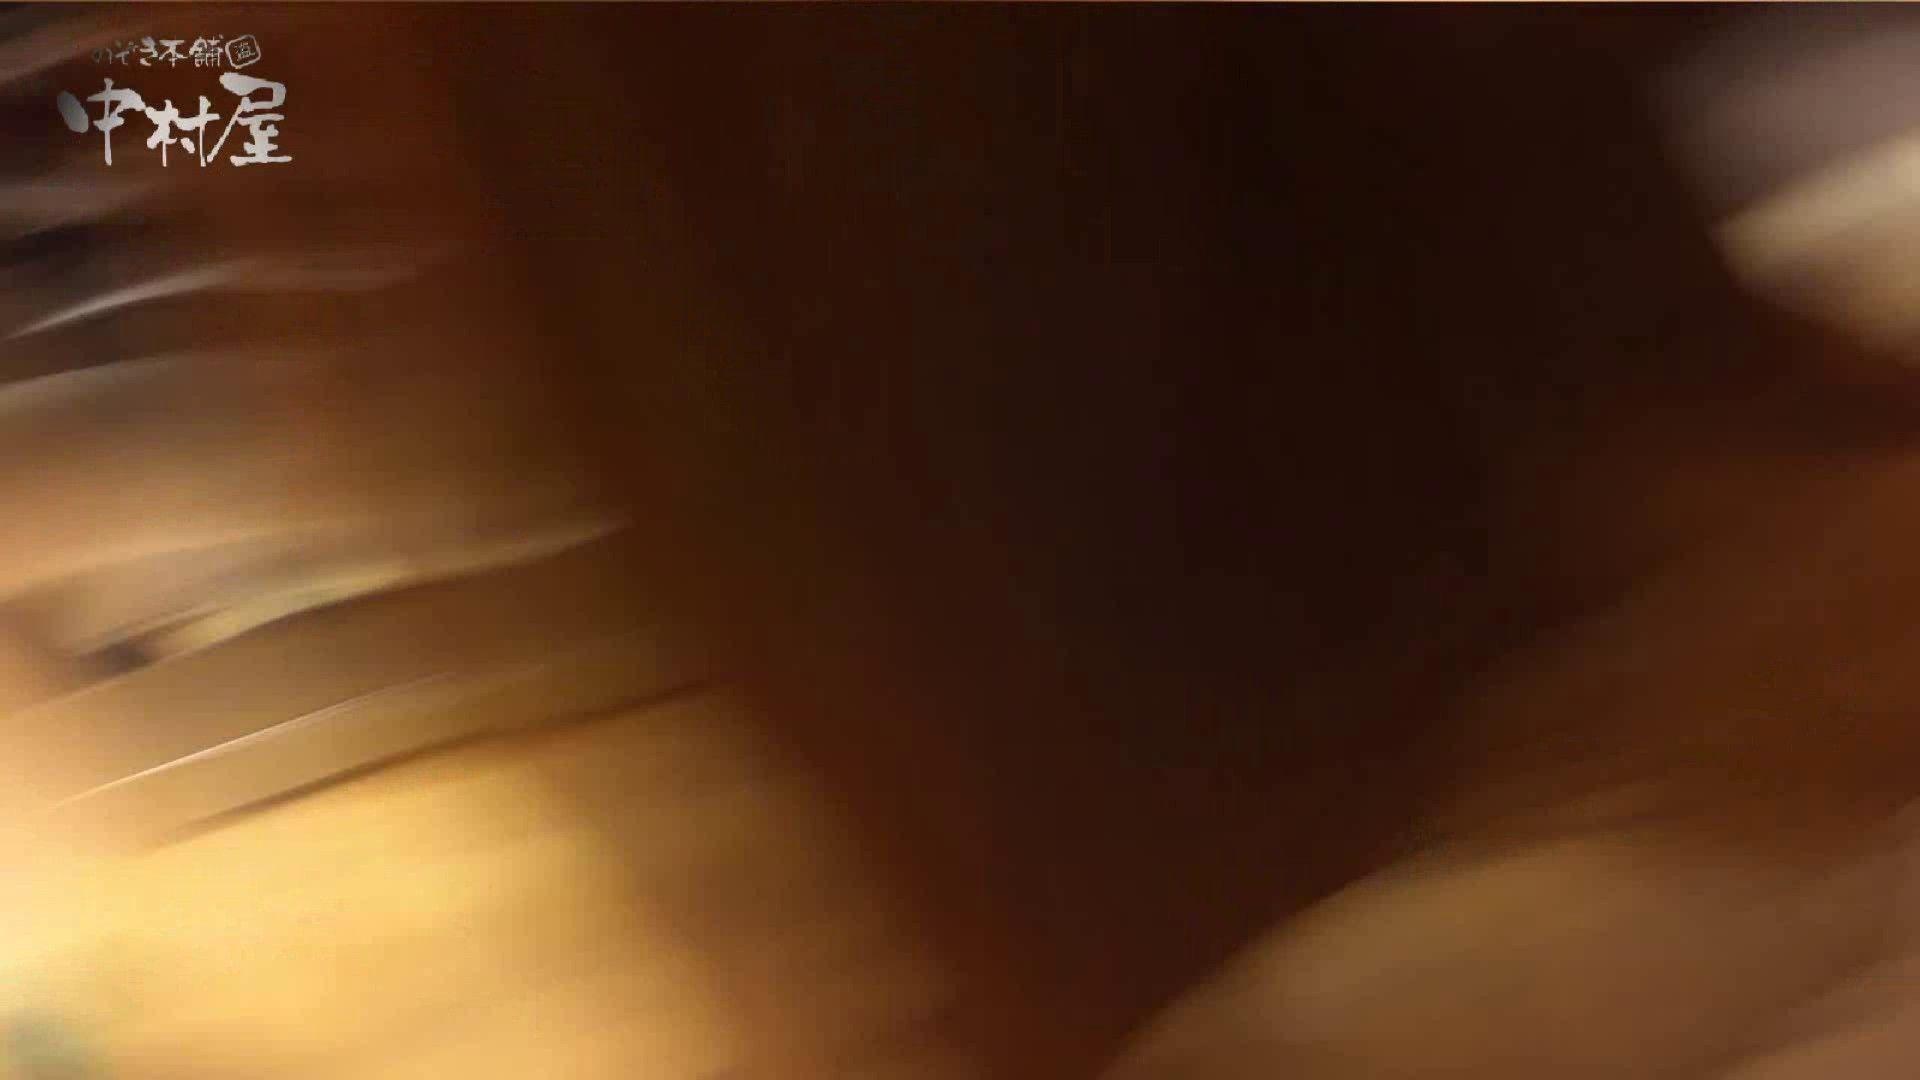 vol.84 美人アパレル胸チラ&パンチラ 帽子オネェさんに胸元アタック! 接写  94連発 18